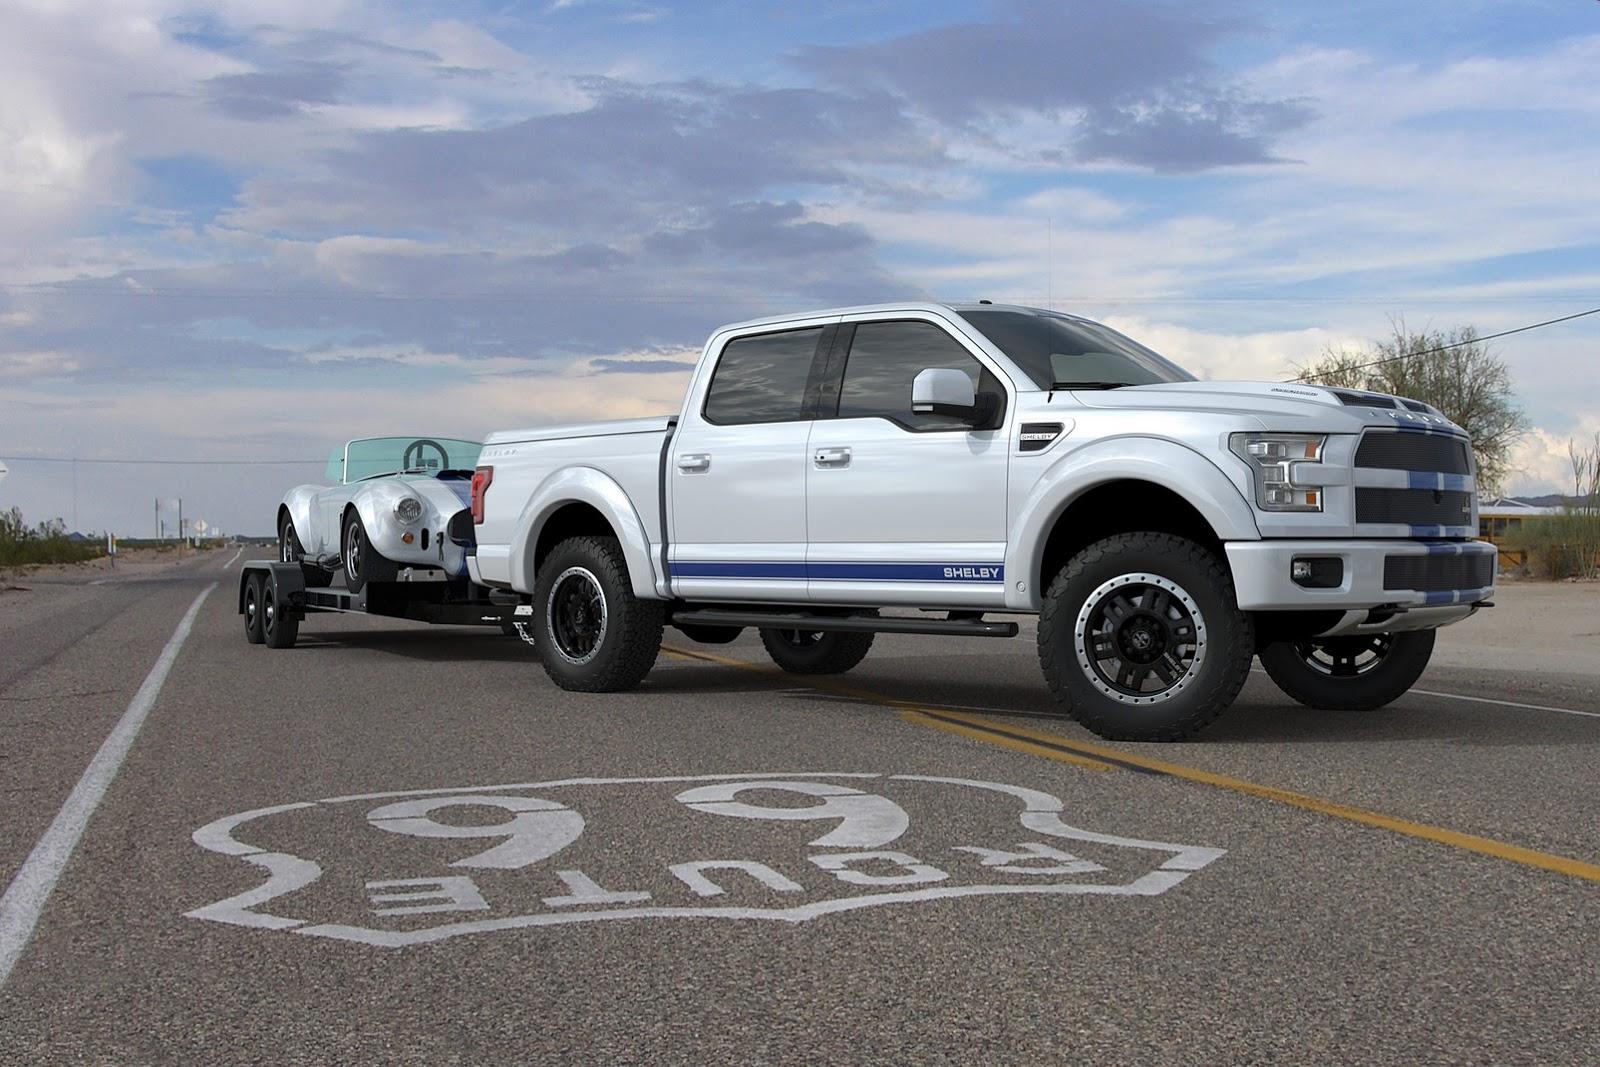 shelby f-150 - cobra pickup truck - motorblock